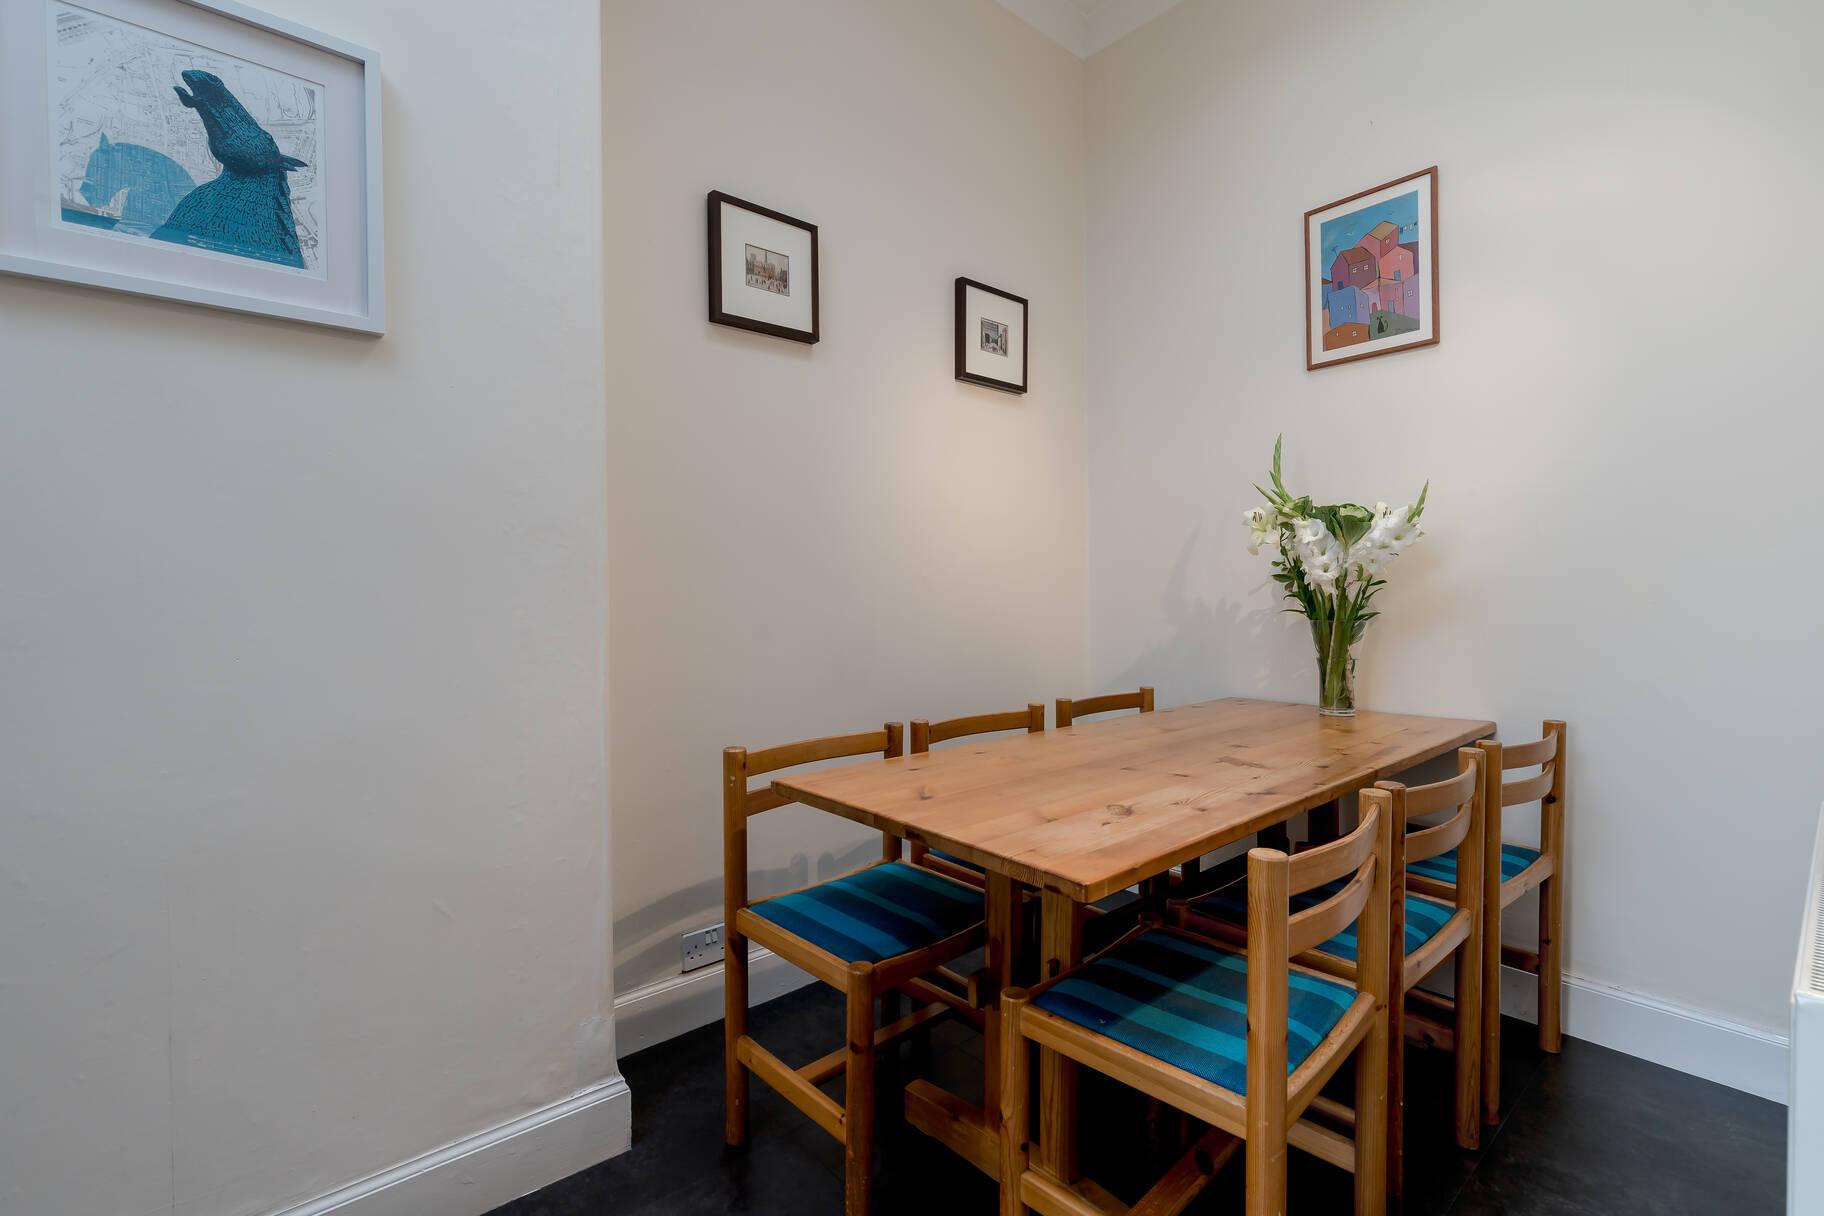 39/6 Woodburn Terrace, Morningside, Edinburgh, EH10 4ST